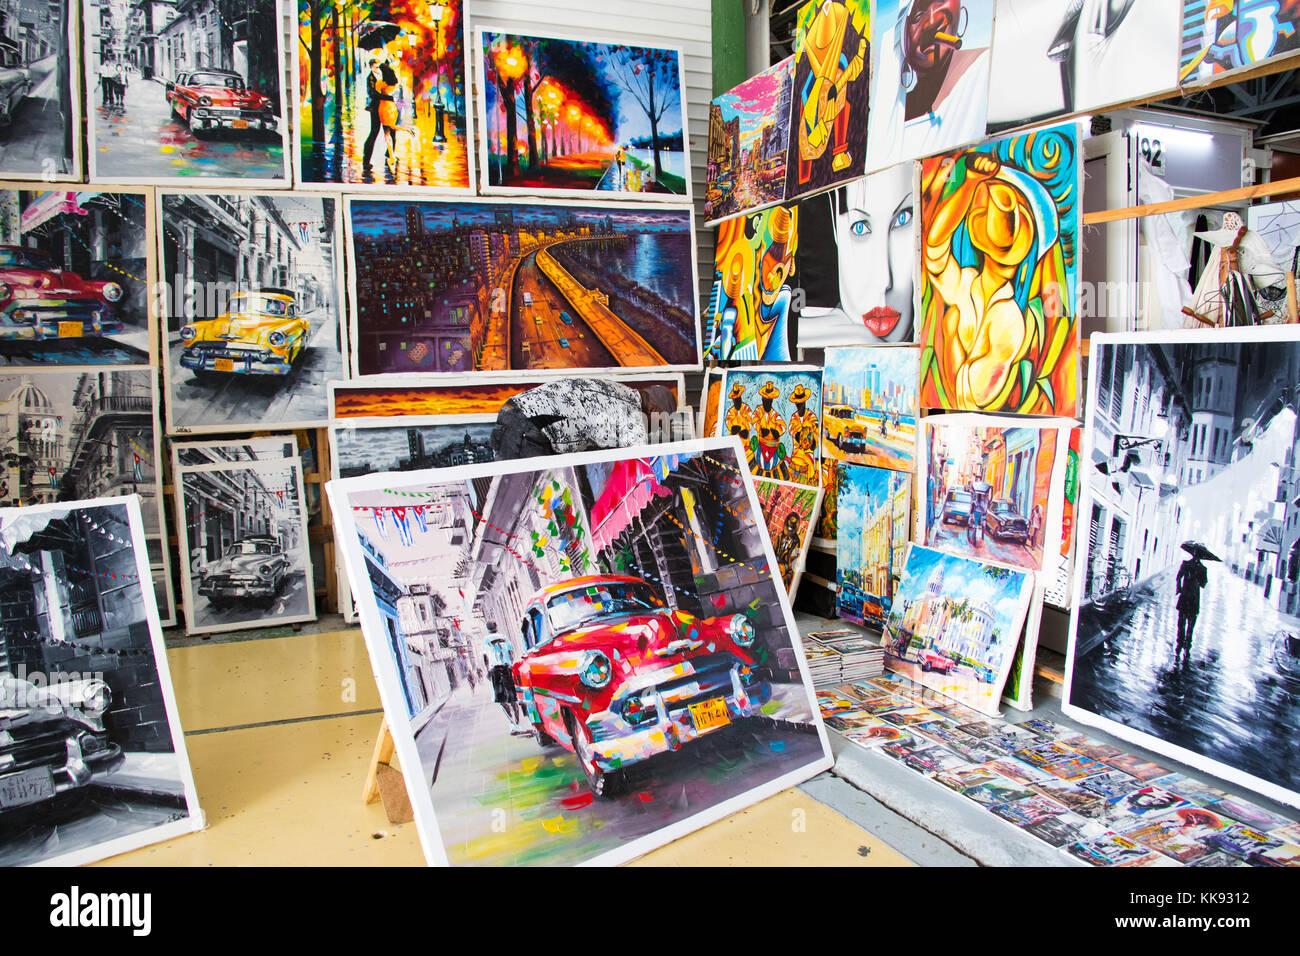 Centro Cultural Antiguos Almacenes De Deposito San Jose mercato, Havana, Cuba Immagini Stock